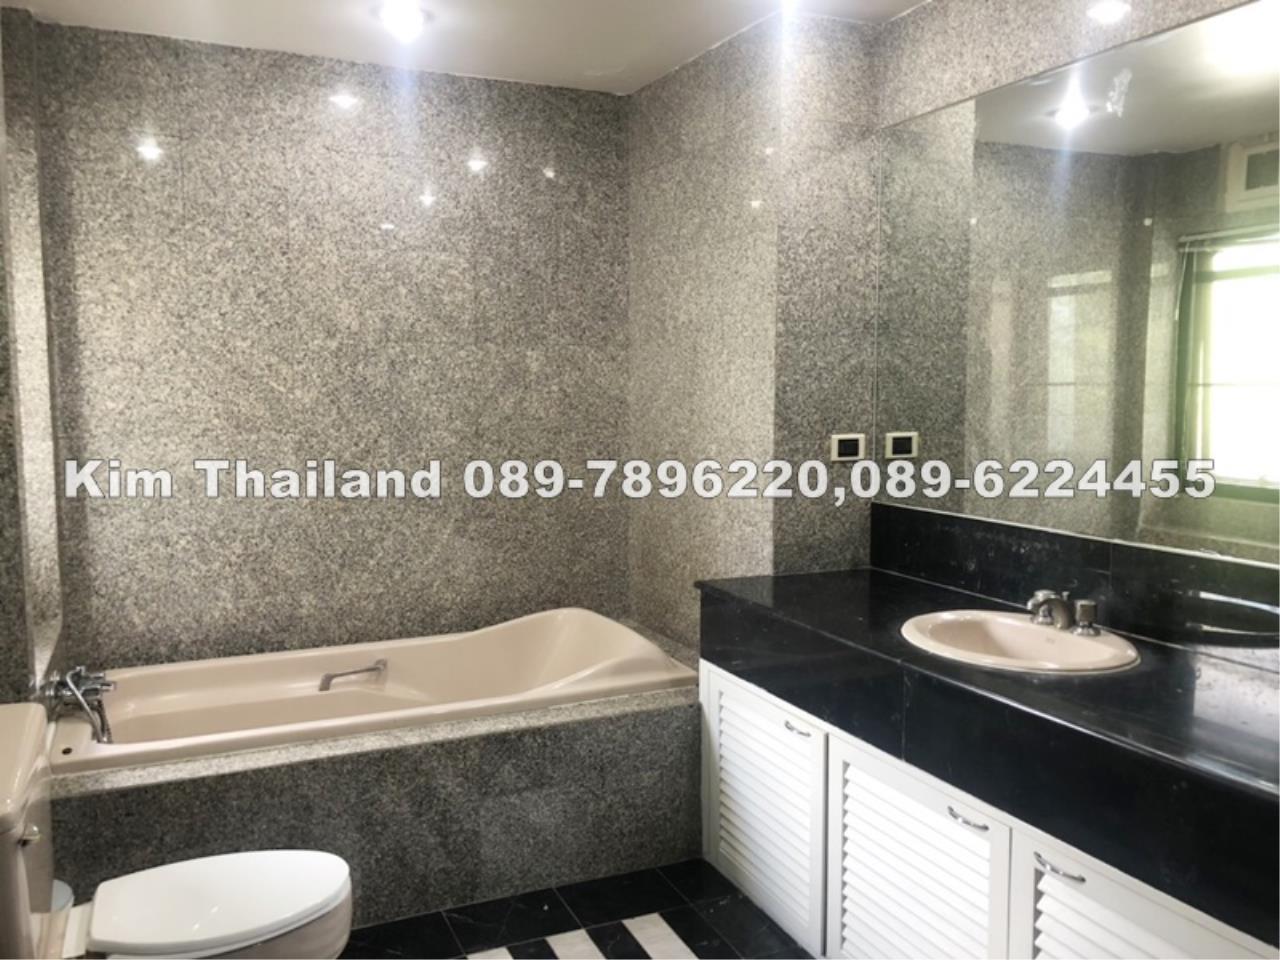 Kim Thailand Agency's ขายทาวน์เฮ้าส์ 4 ชั้น ย่านสุขุมวิท71 พื้นที่ 29.9 ตารางวา 4 ห้องนอน ขาย 15.7 ล้านบาท 12